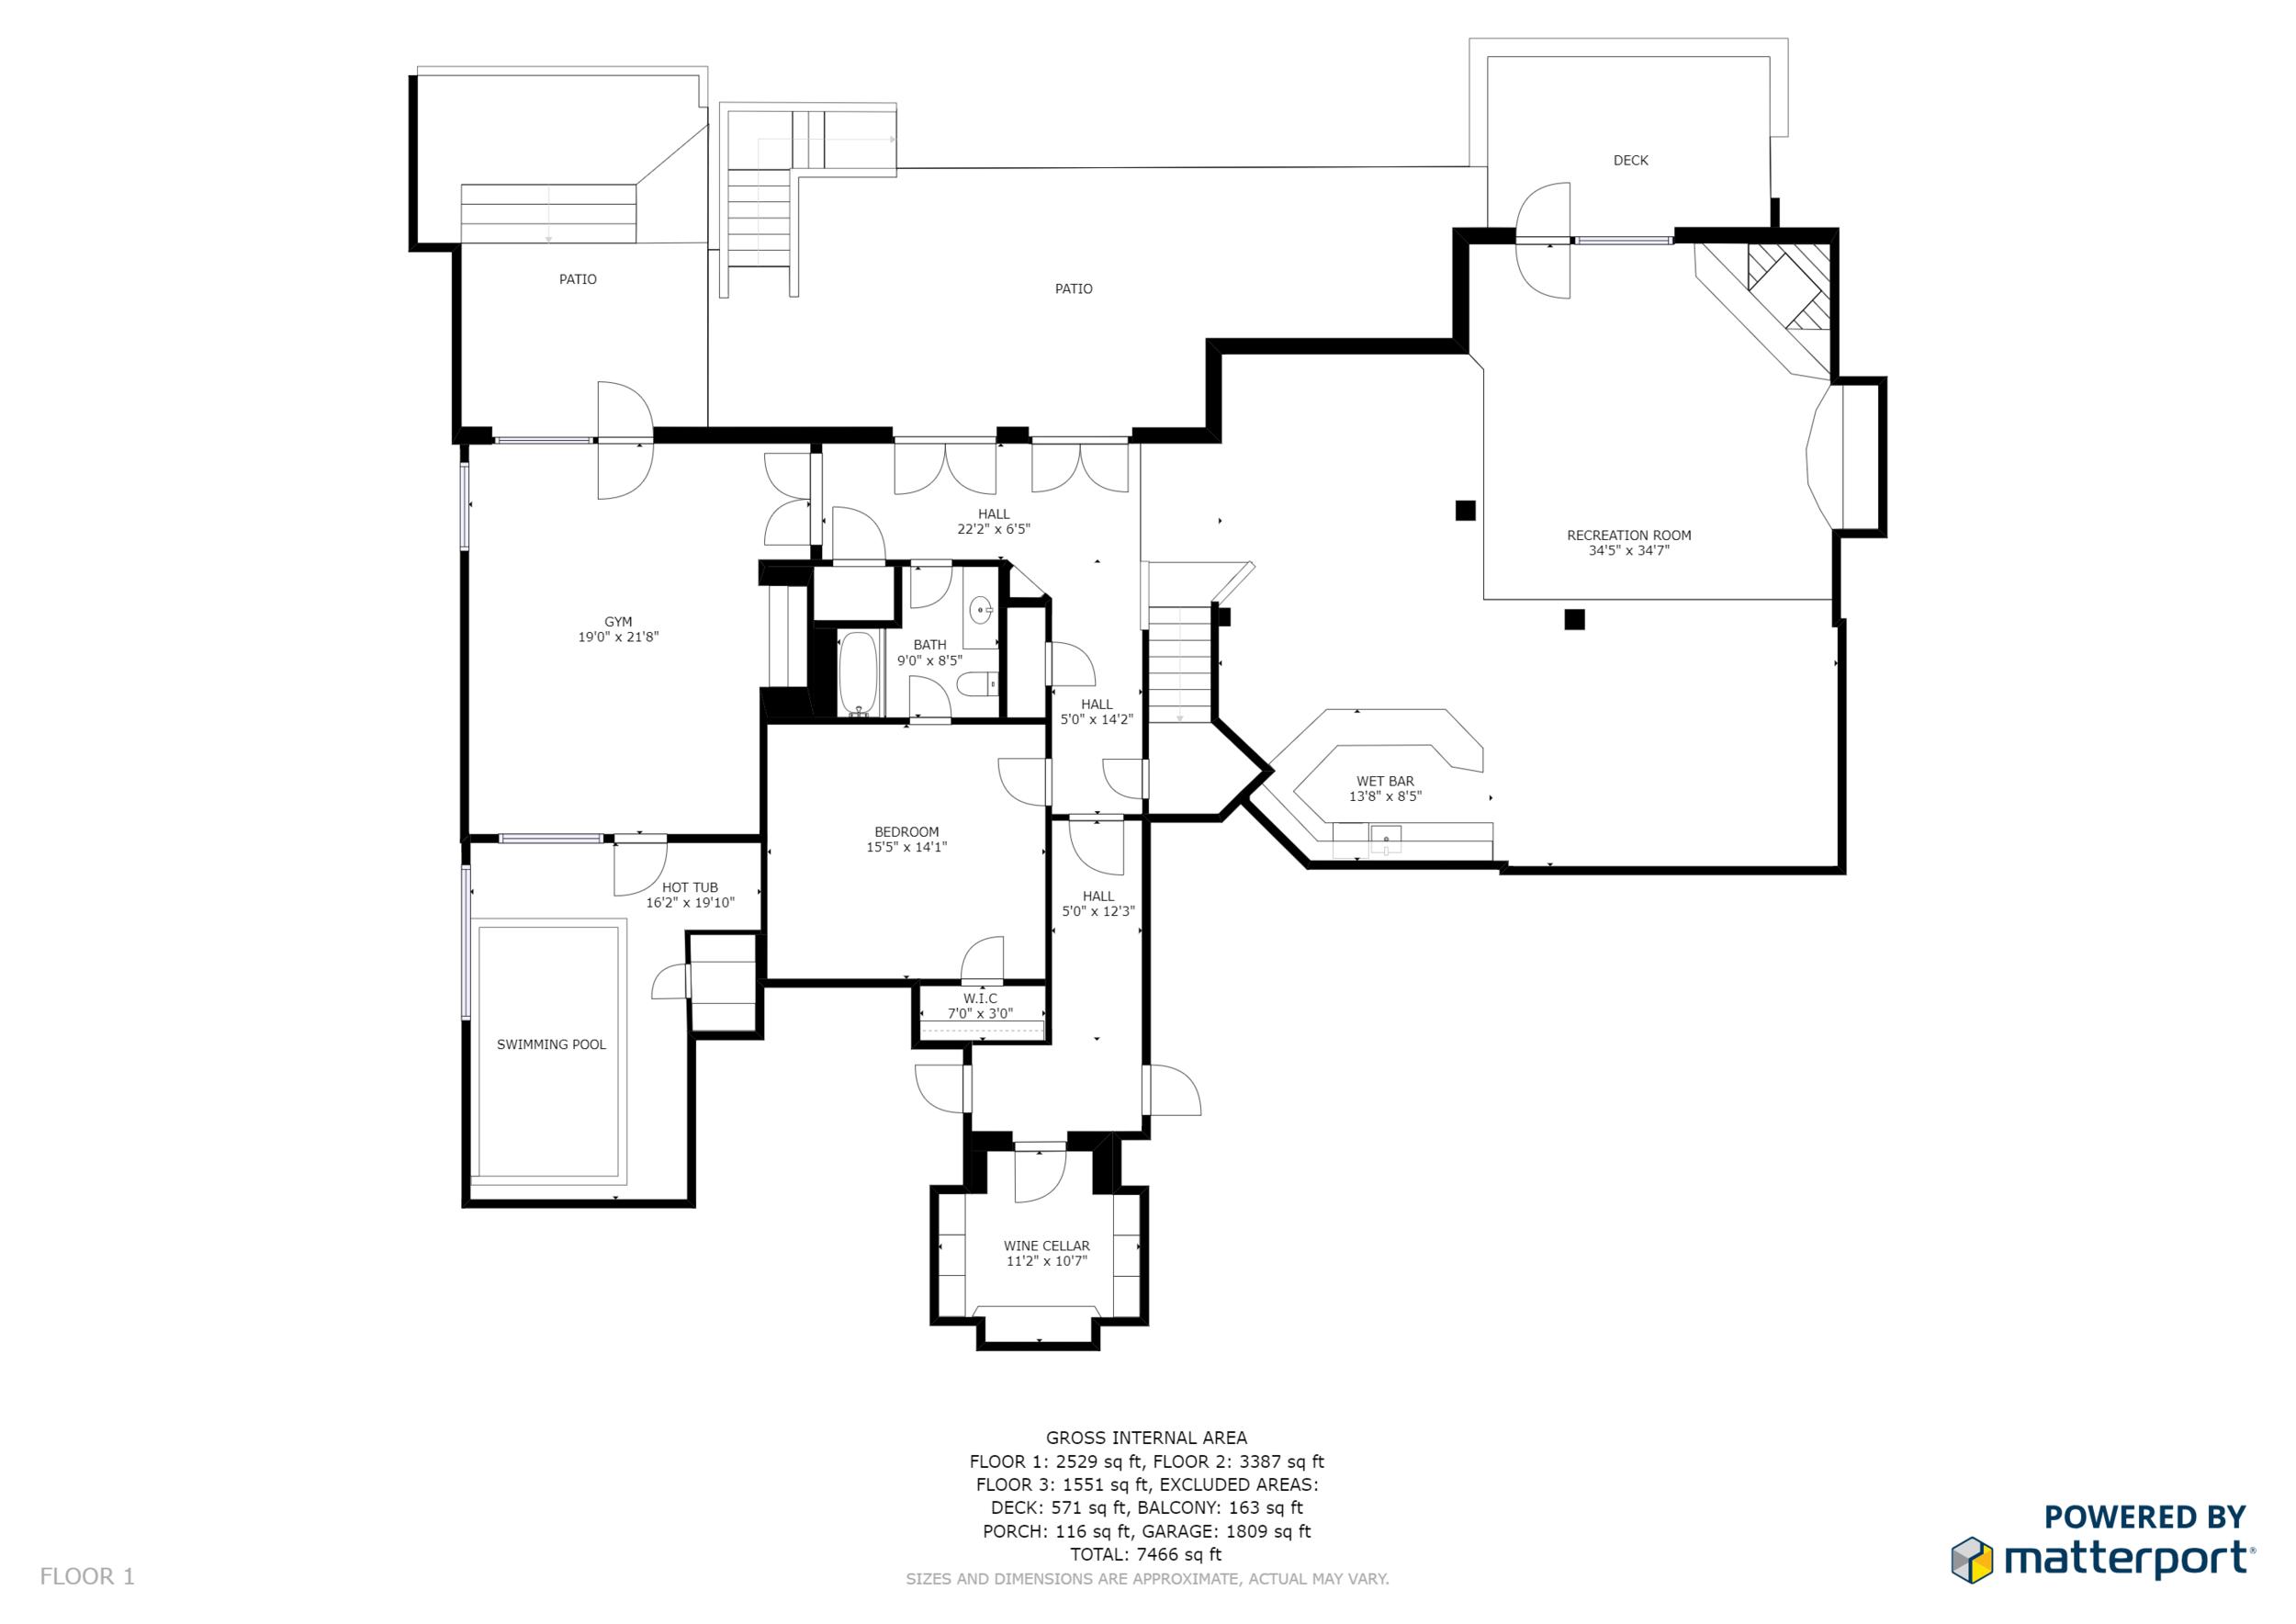 Black and White Floor Plan No Branding Floor 1